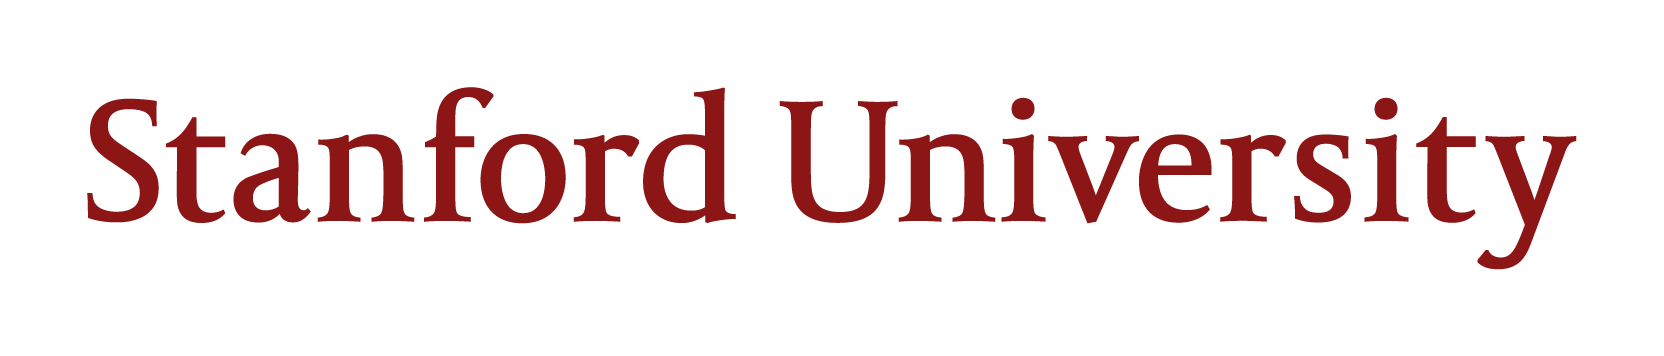 University Hdpng.com  - Stanford University, Transparent background PNG HD thumbnail